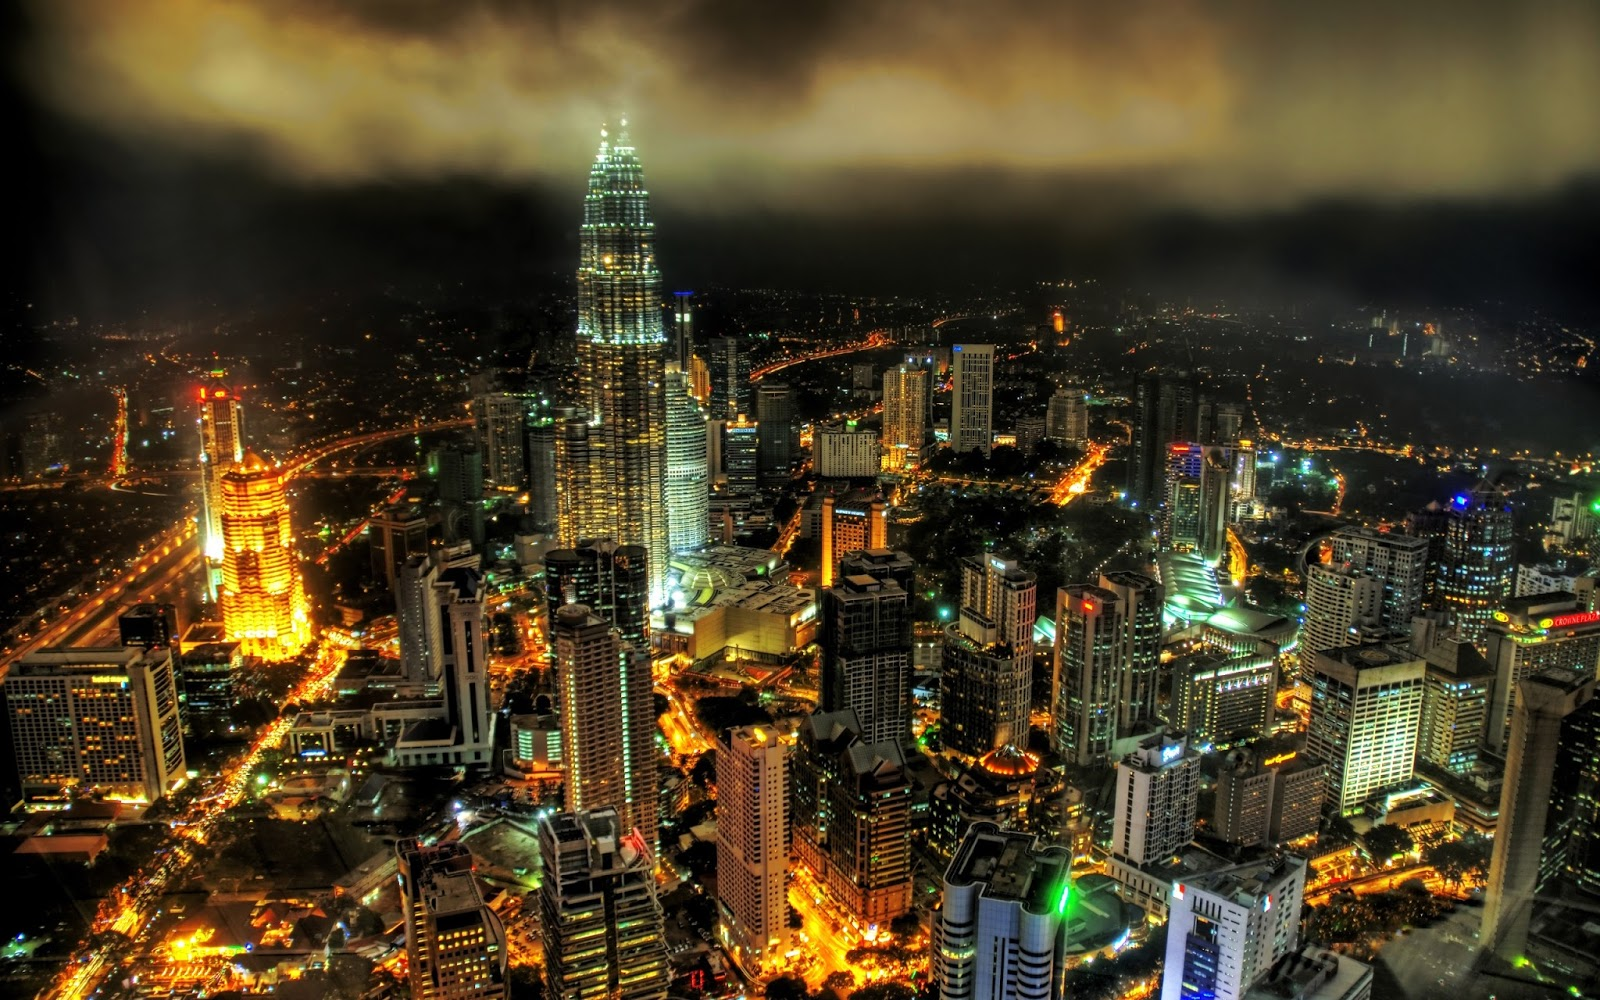 Kuala Lumpur Beautiful Hd Wallpapers: Malaysia HD Wallpapers - HDWallpapers360